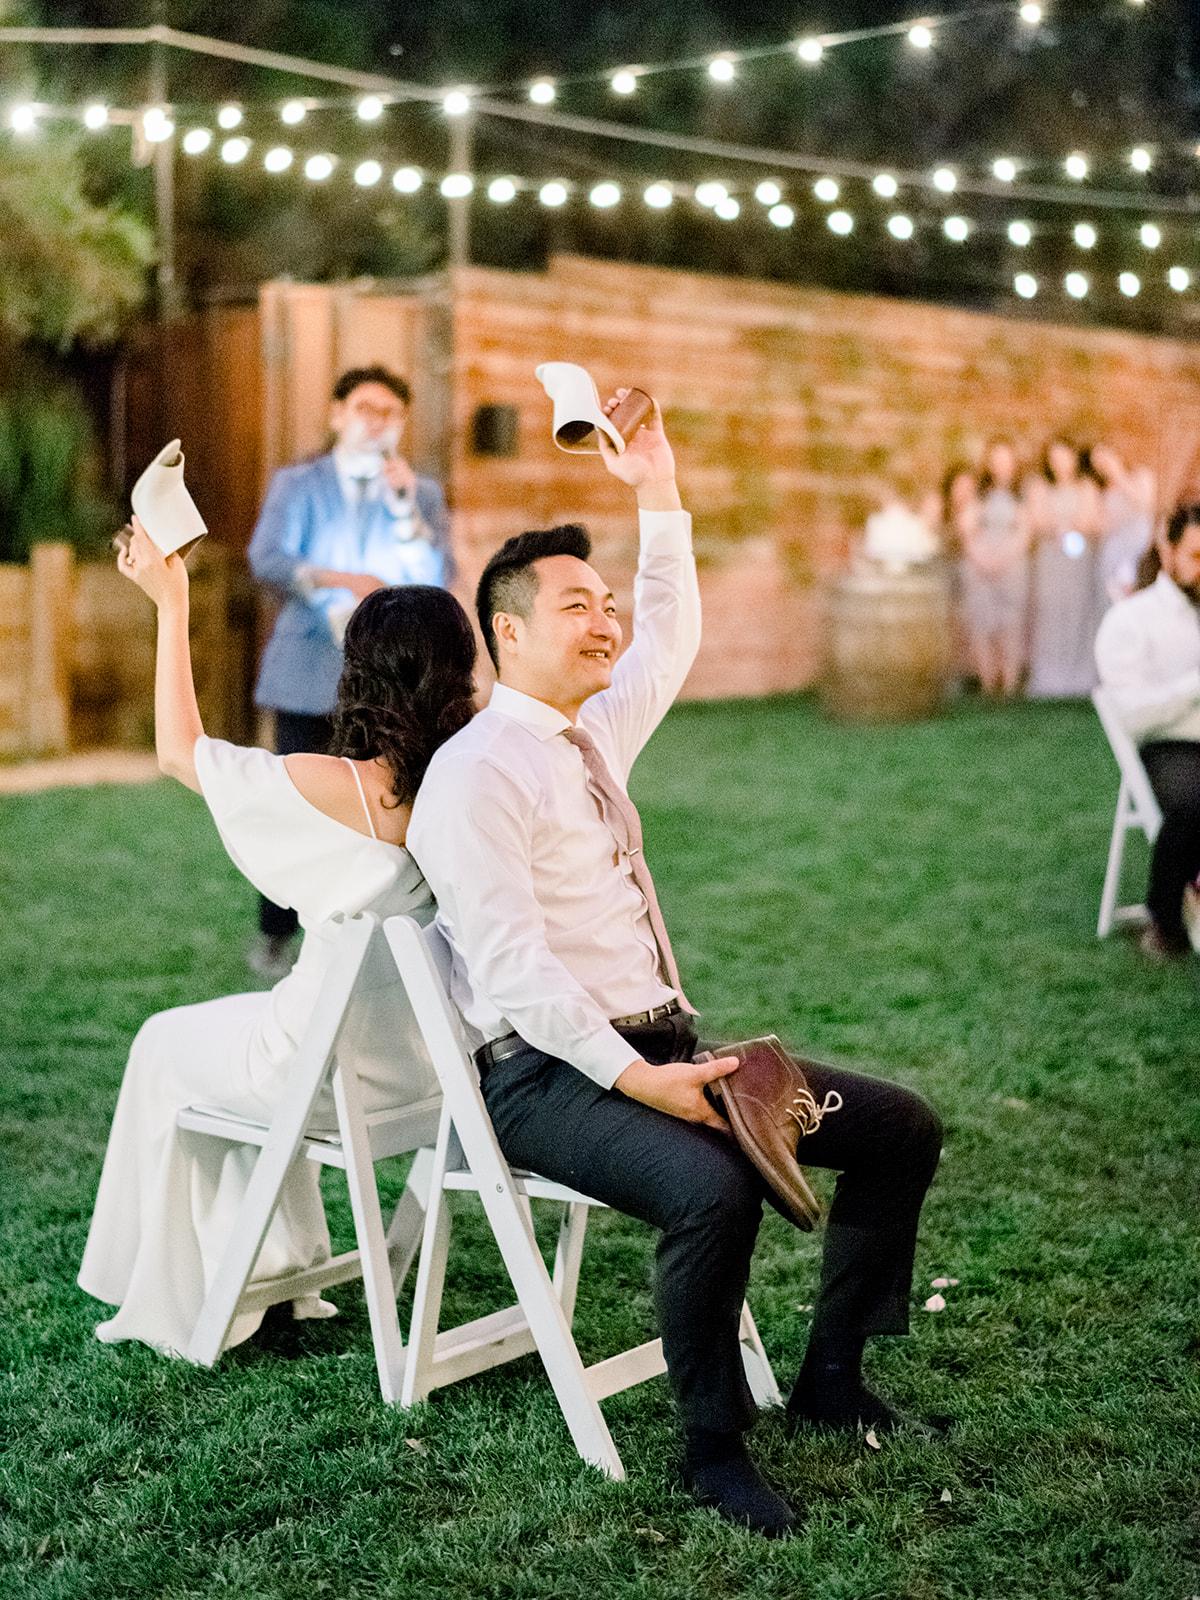 jueunandjon-etherandsmith-wedding-1582.jpg